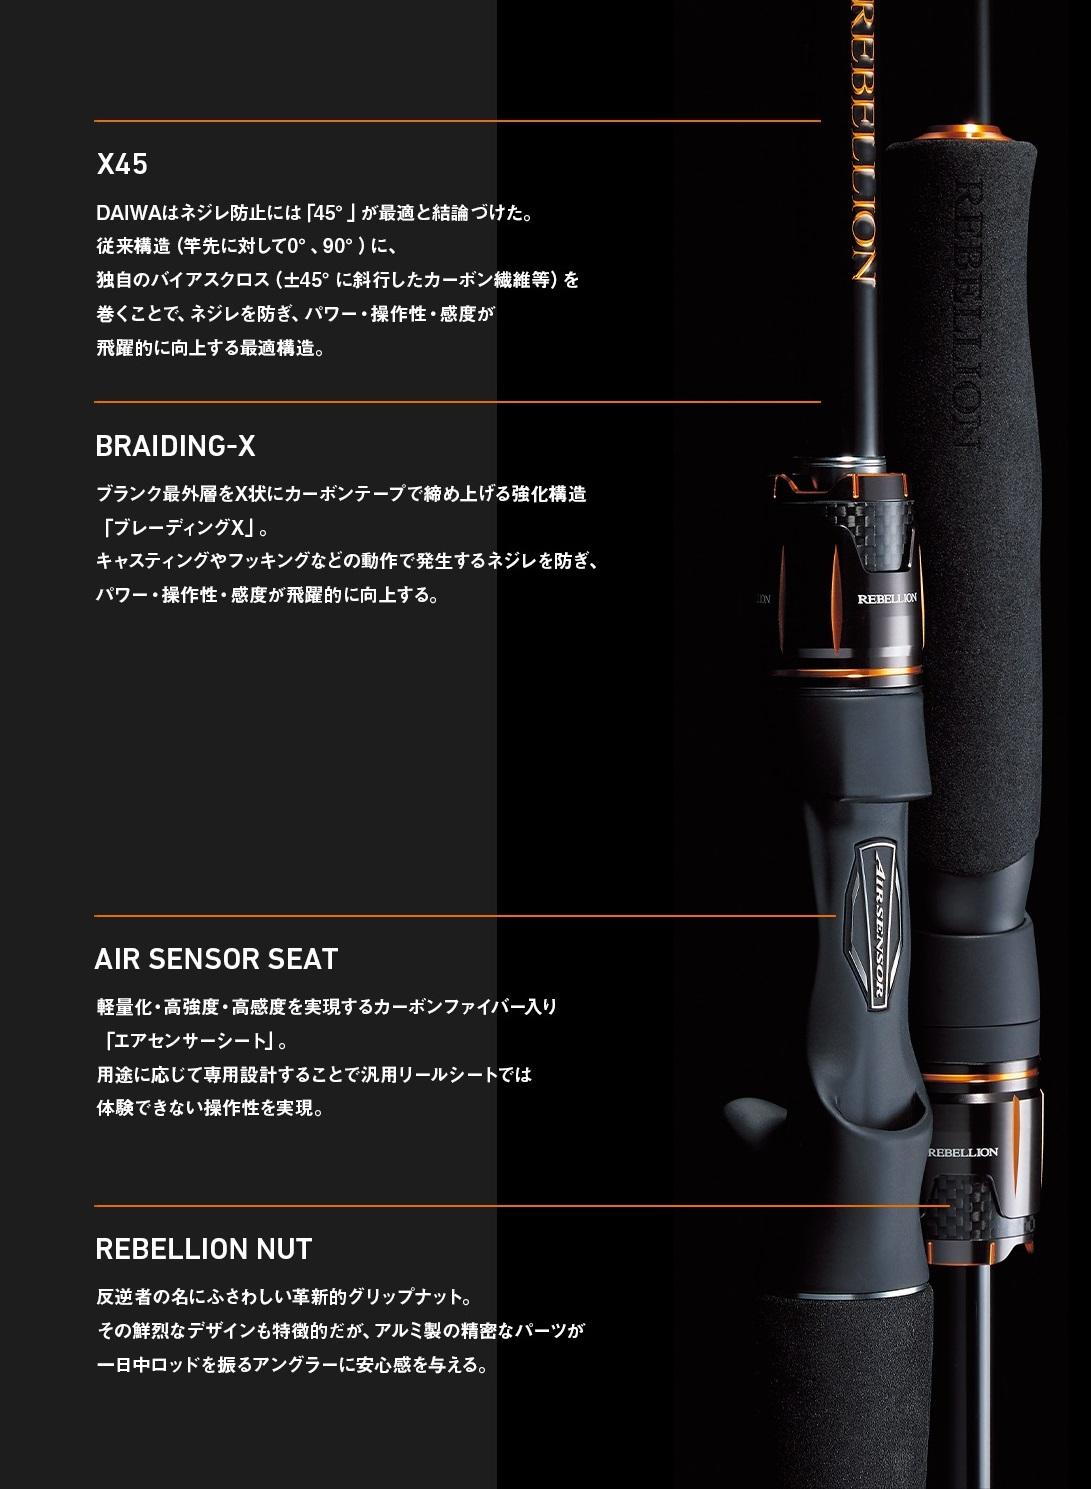 Daiwa Rebellion Casting dettagli